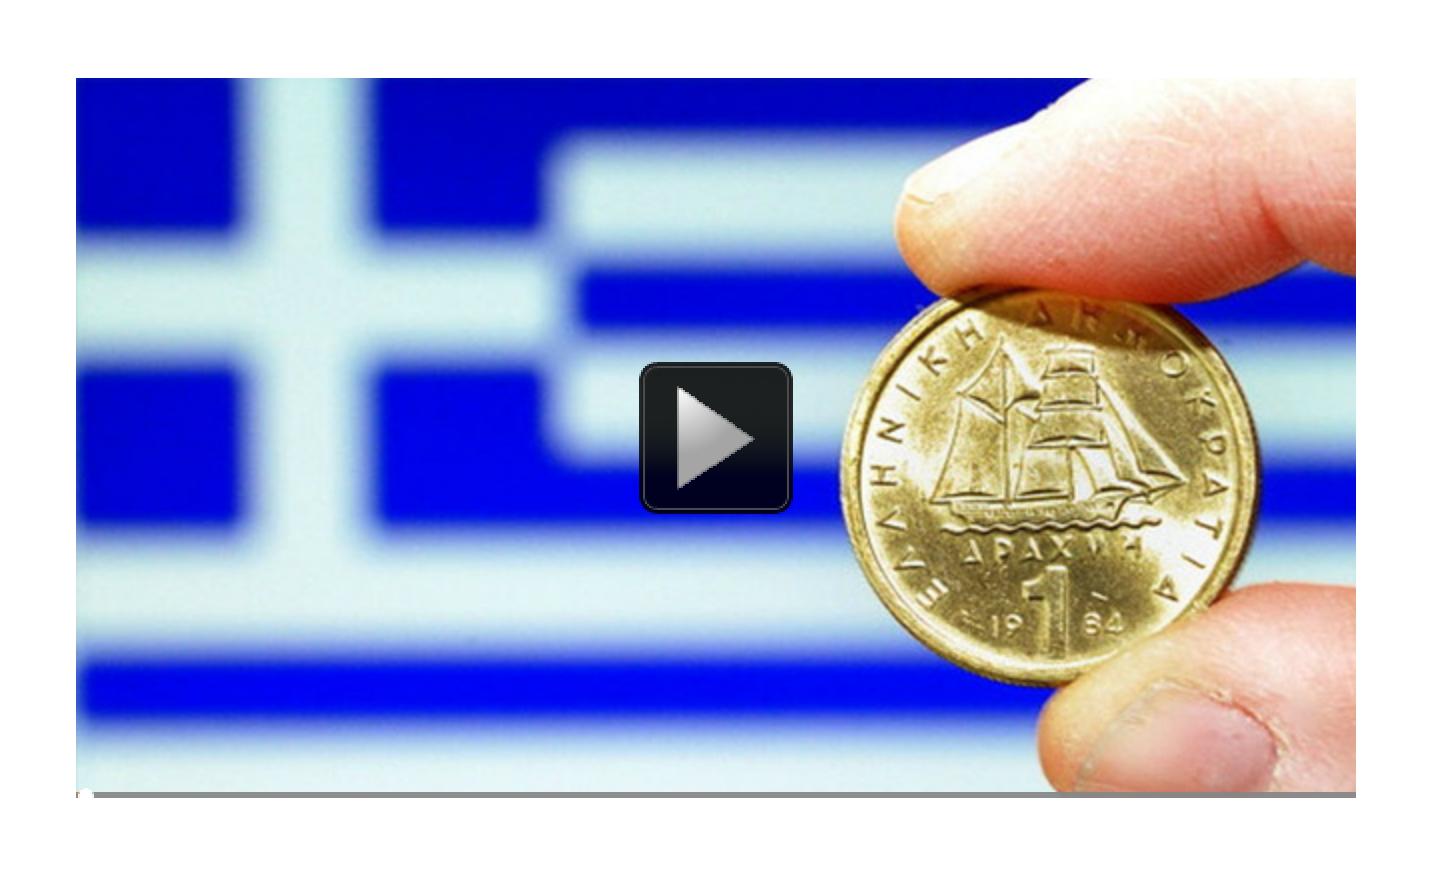 x85% Chance of Greece Leaving Euro Zone - El-Erian